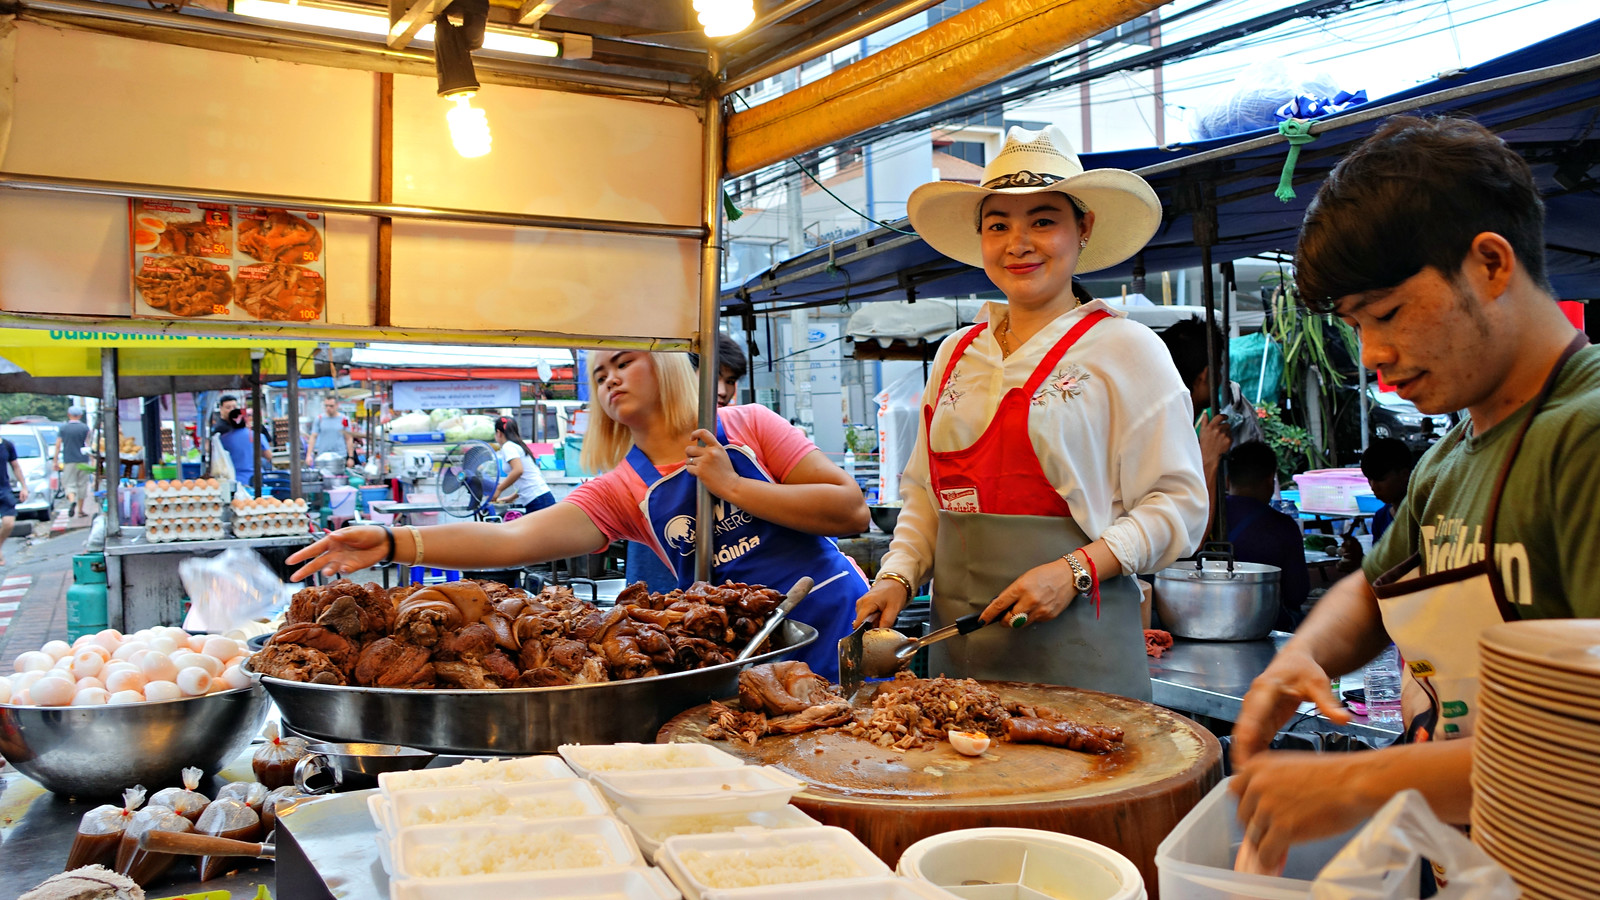 Cowboy Hat Lady at Khao Kha Moo